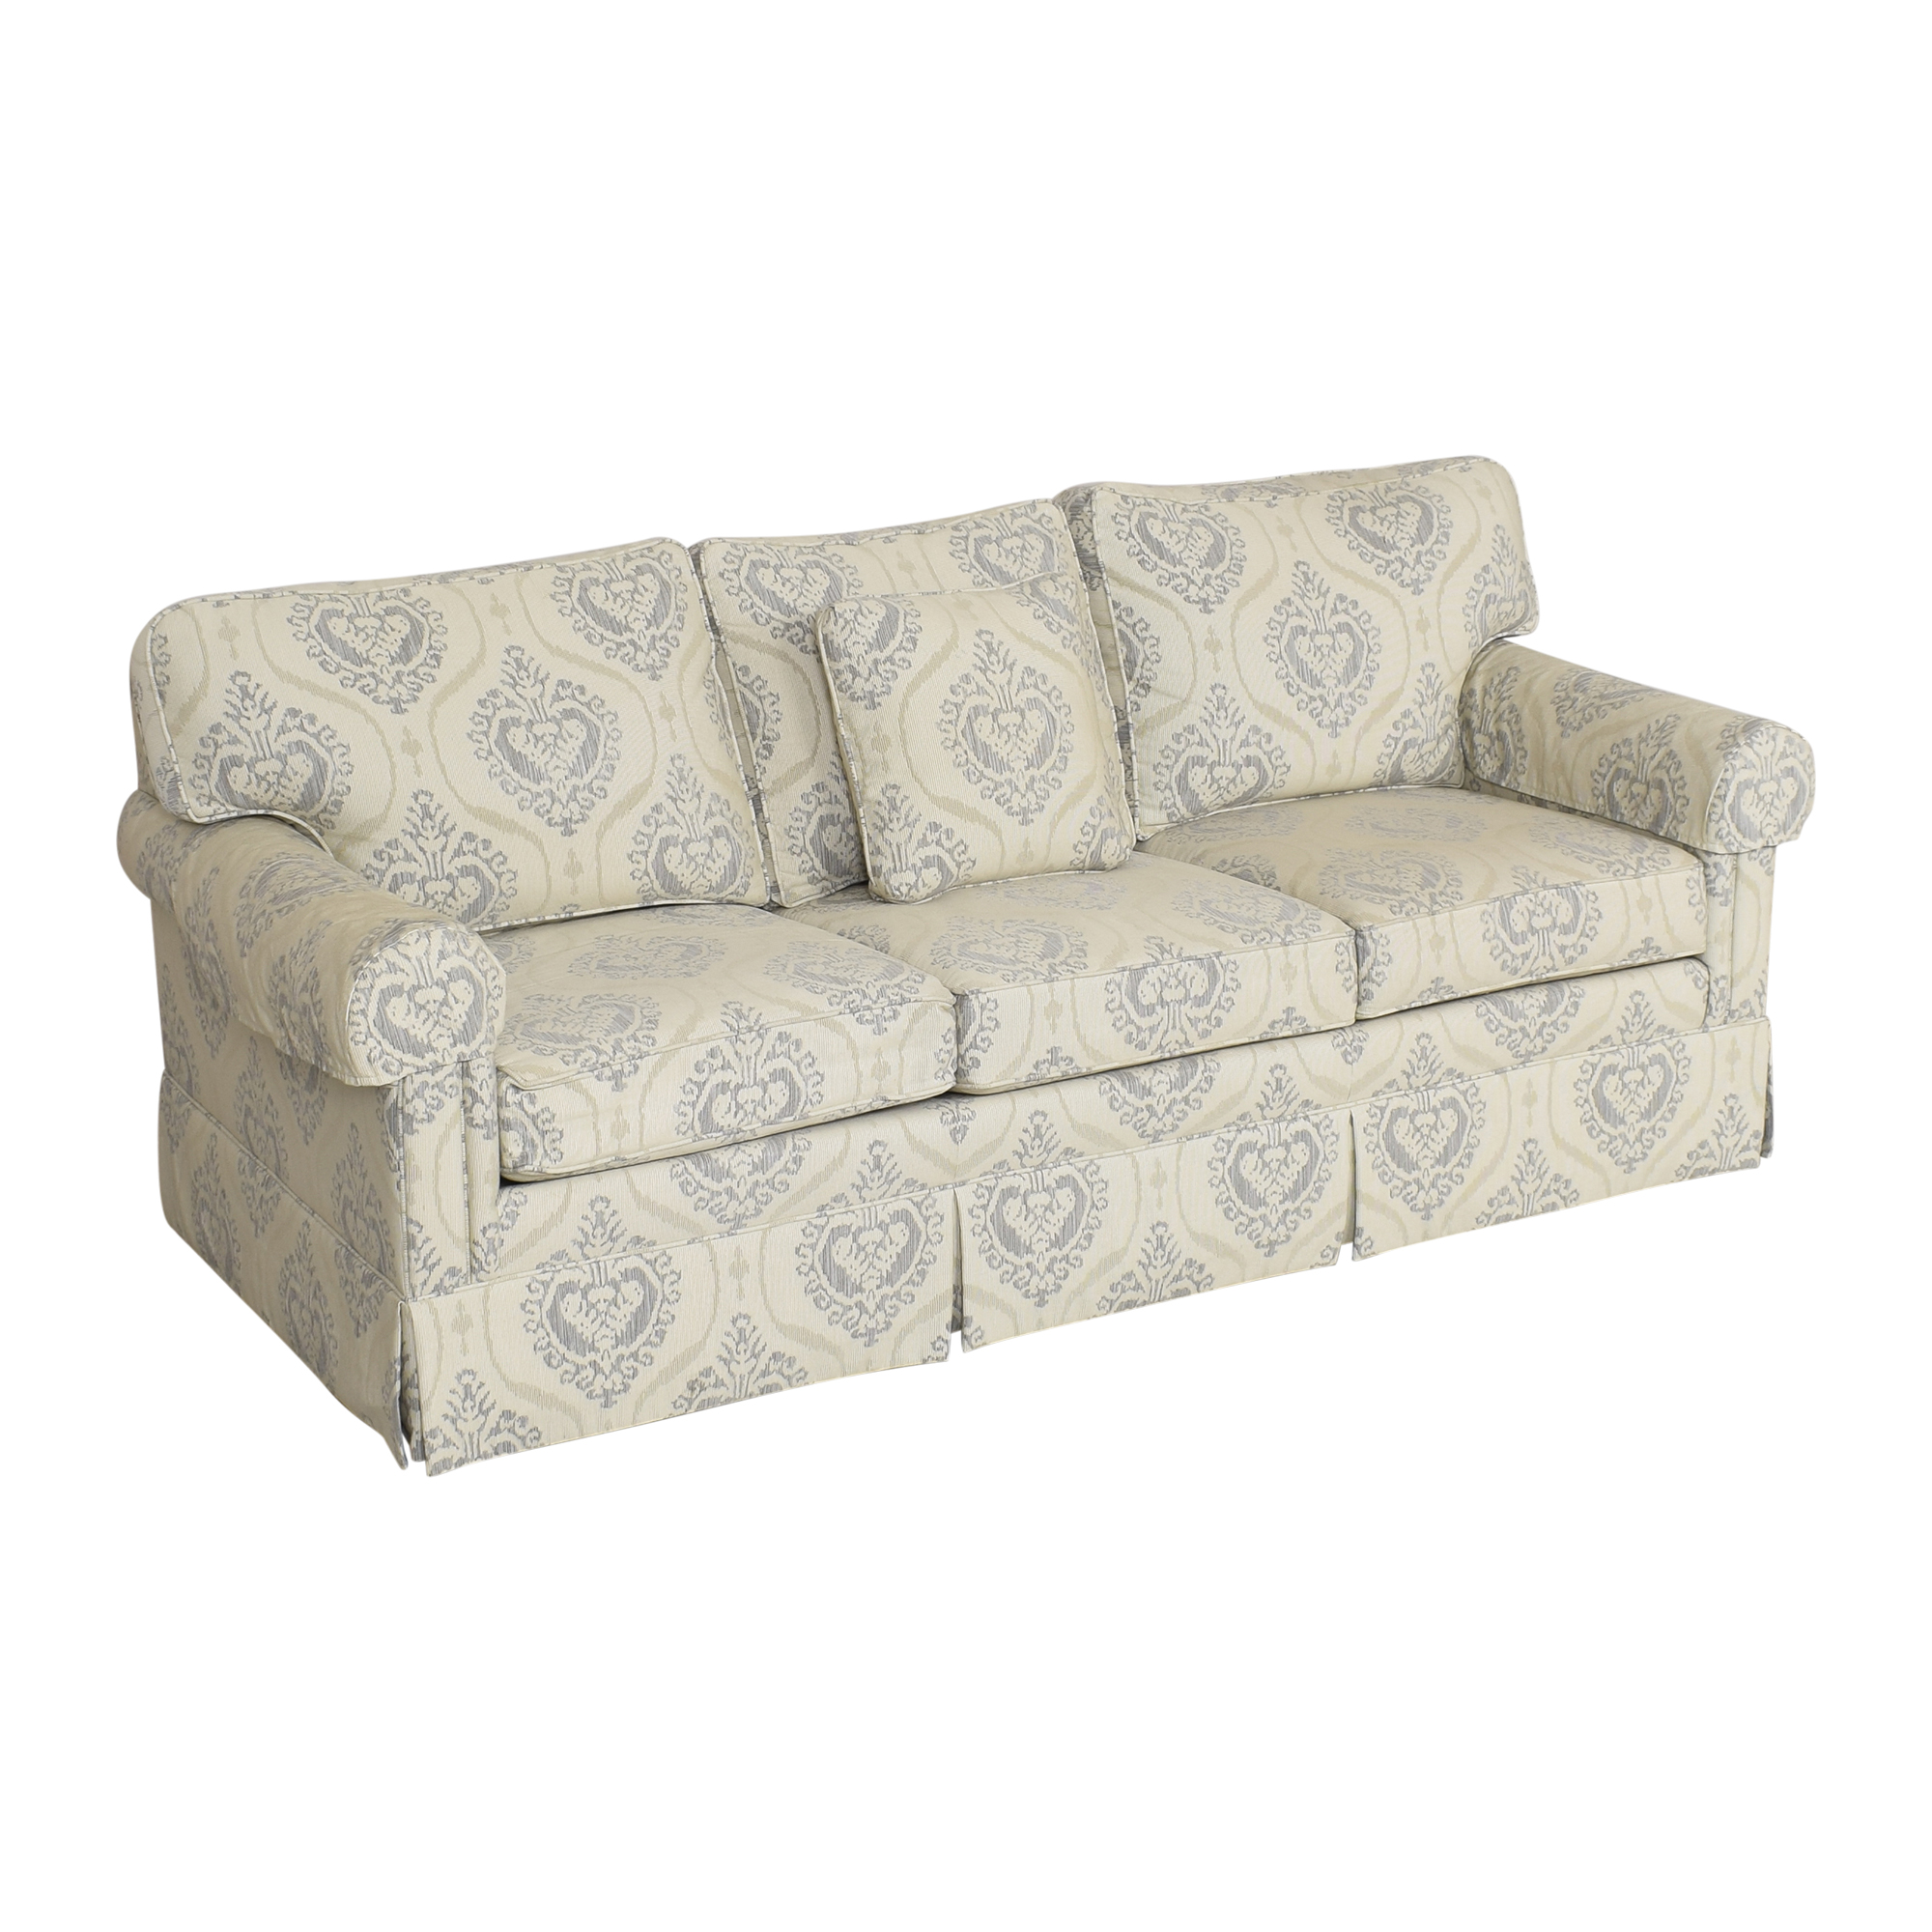 Ethan Allen Ethan Allen Three Cushion Skirted Sofa coupon